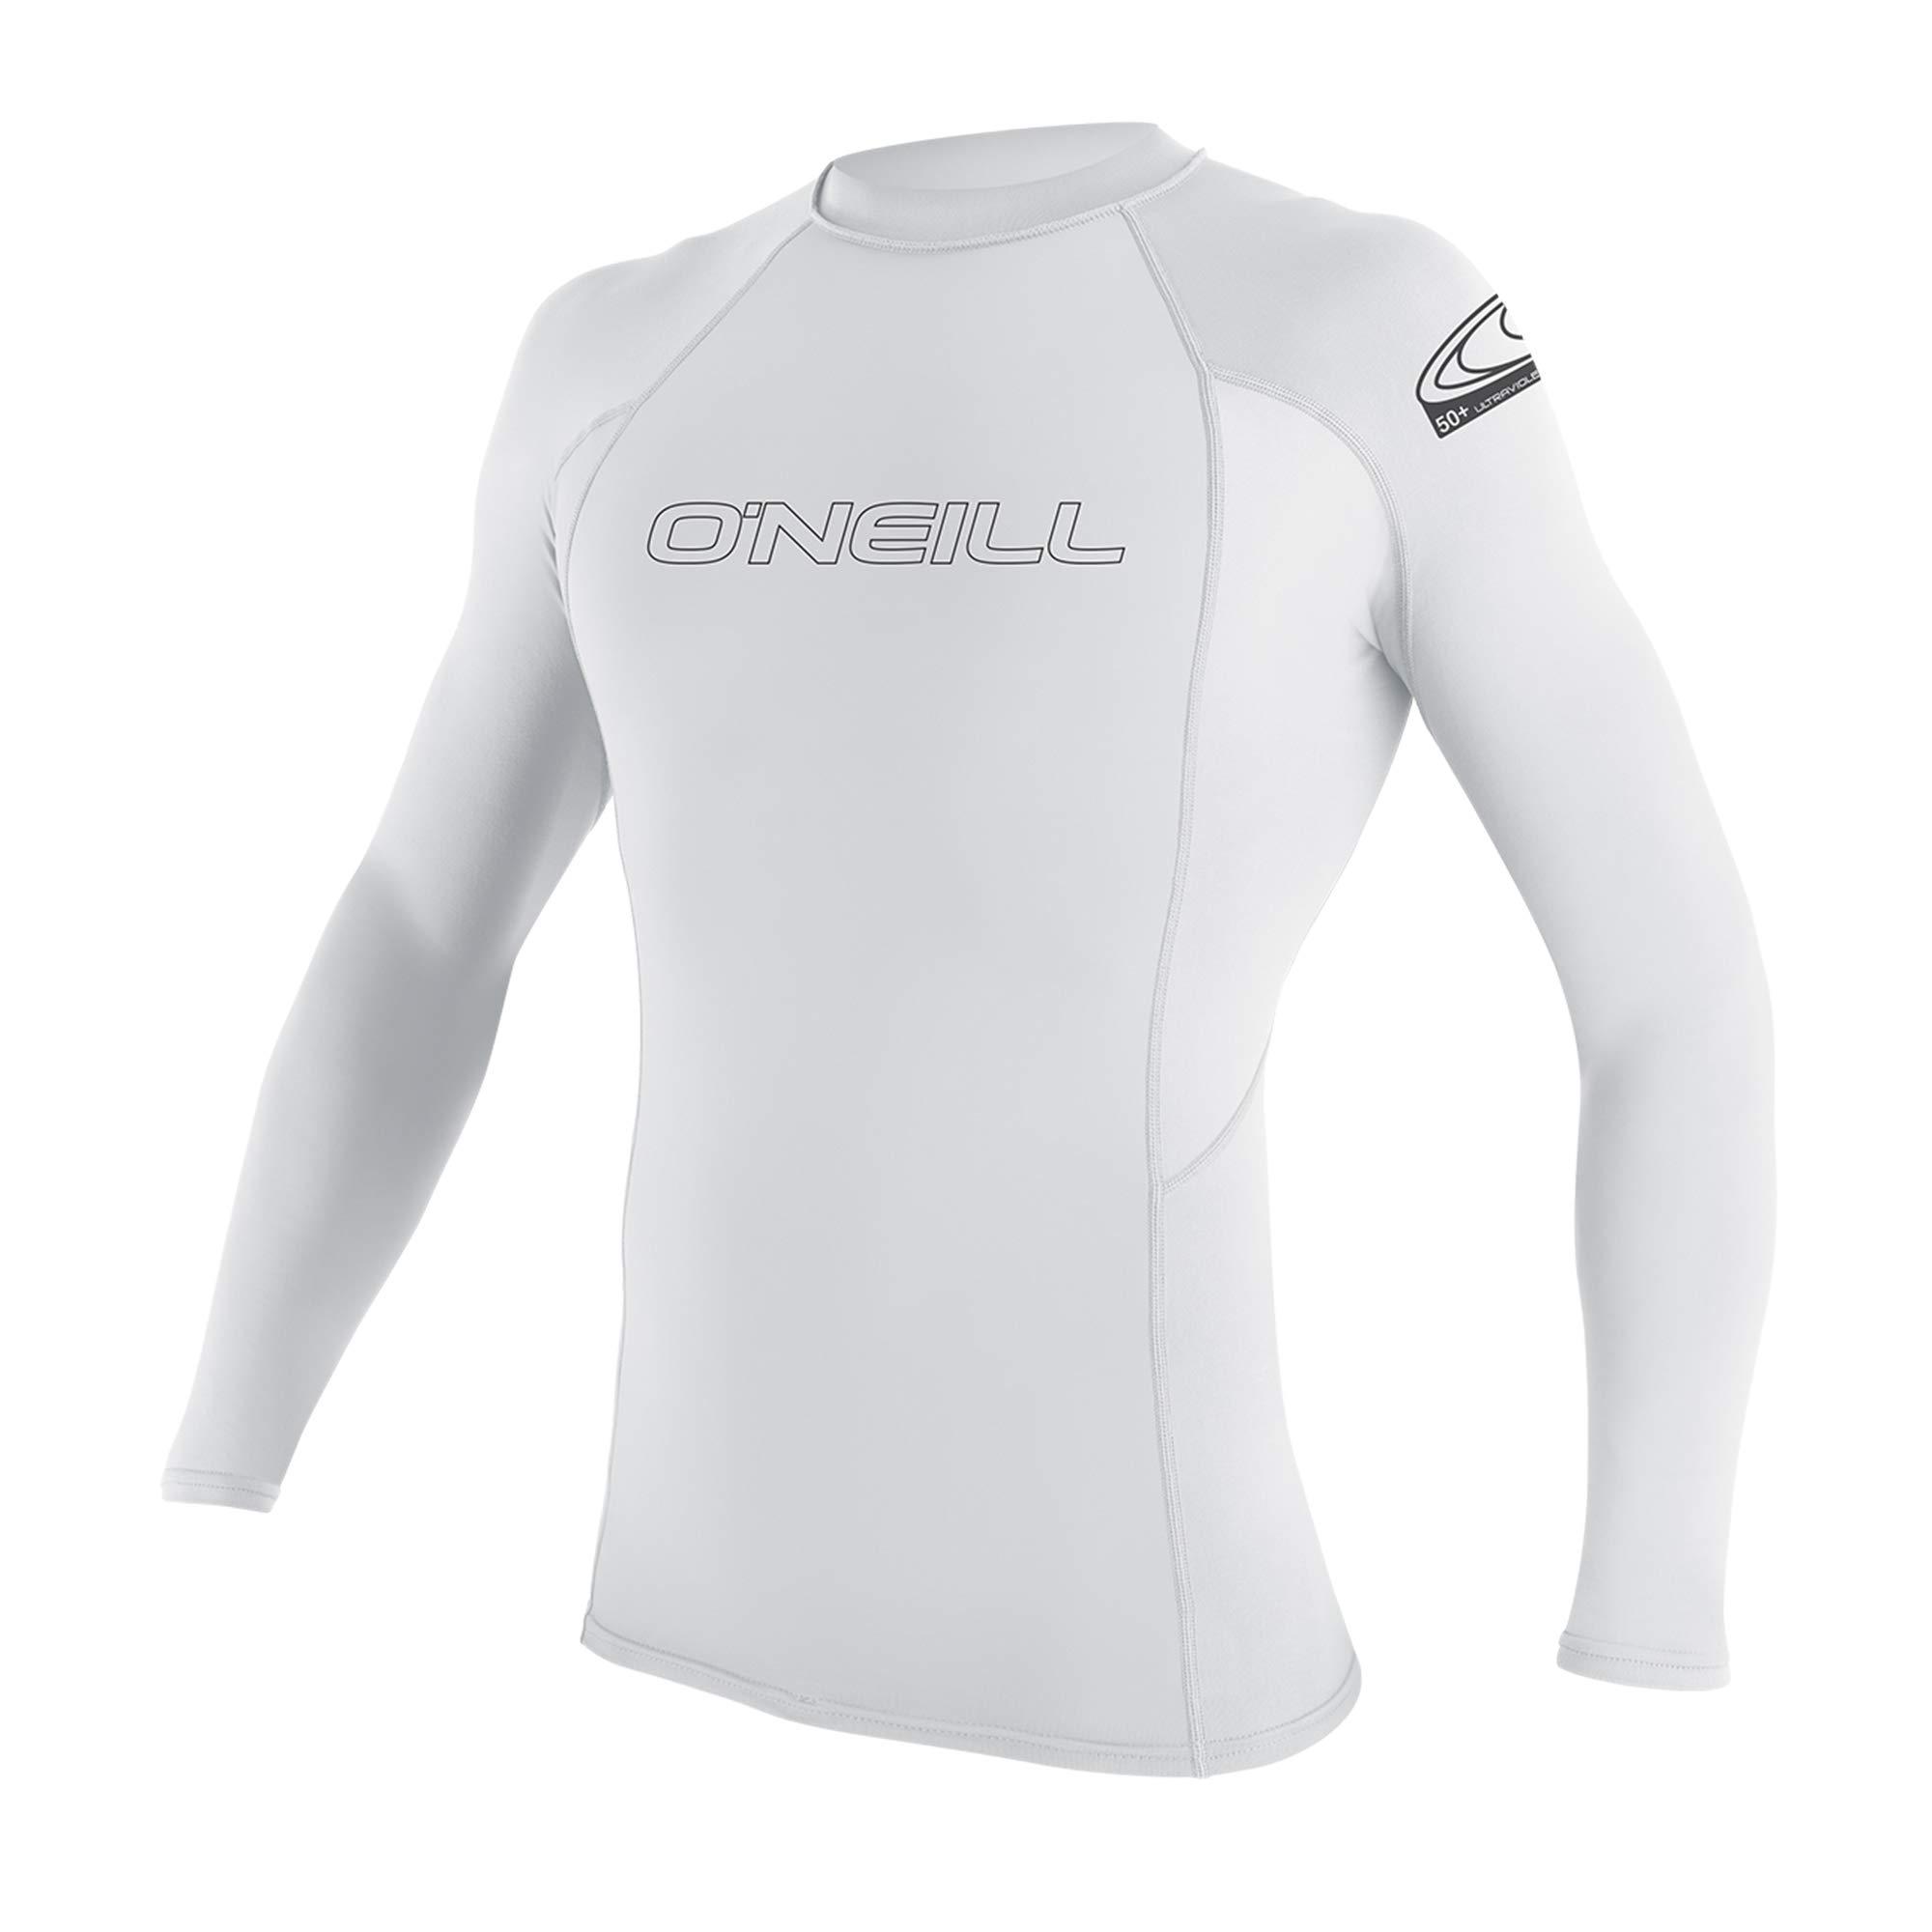 O'Neill Youth Basic Skins UPF 50+ Long Sleeve Rash Guard, White, 8 by O'Neill Wetsuits